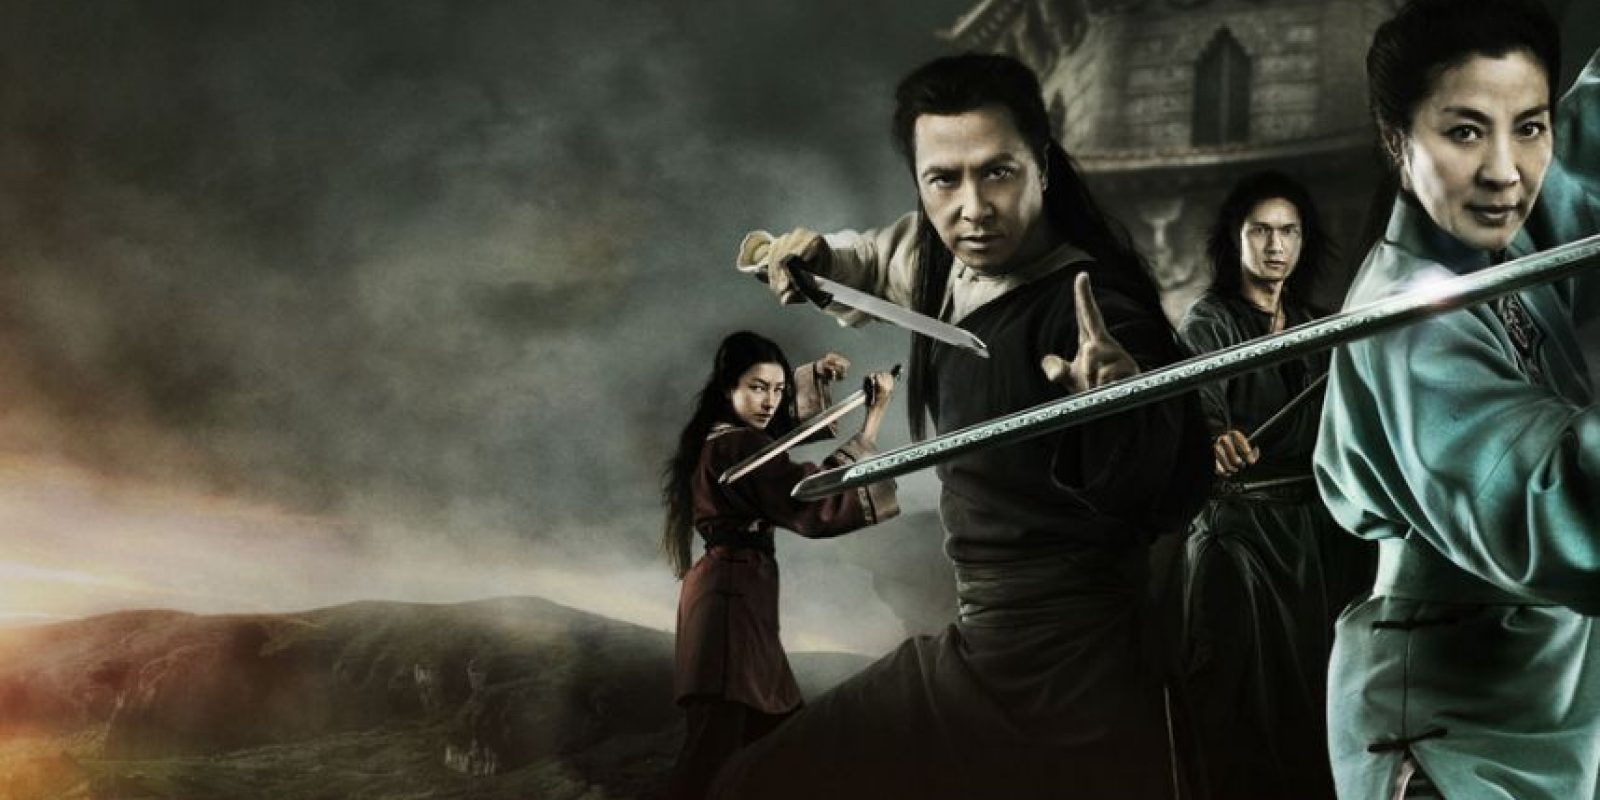 Harry Shum Jr. hace el papel de Wei-Fang Foto:Netflix